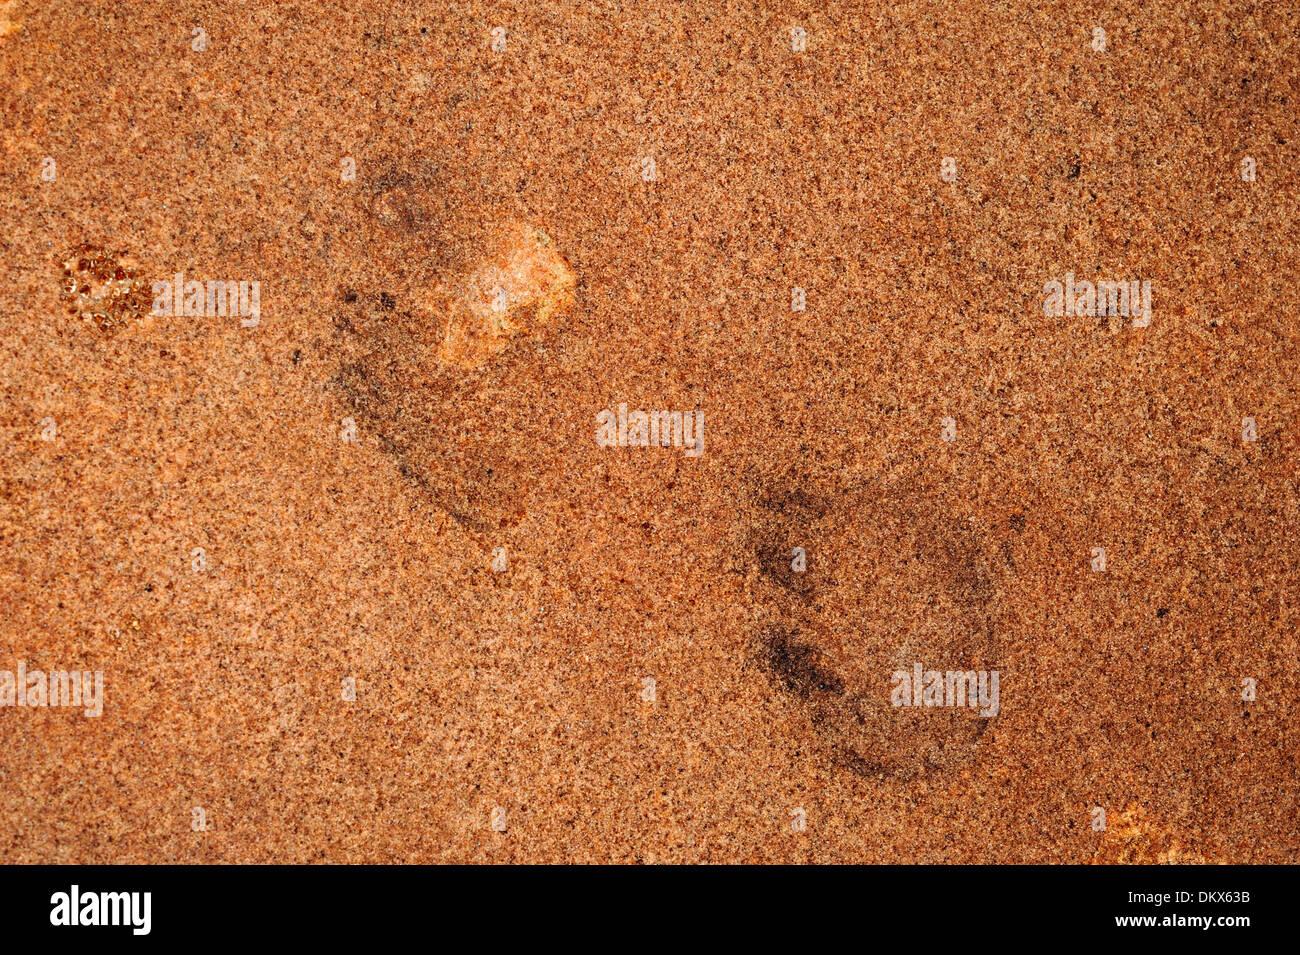 Fossil tracks of mammal-like reptile theterop Laoporus sp., Paleozoic Age, Upper Permian, Cocconino, Arizona, Usa - Stock Image